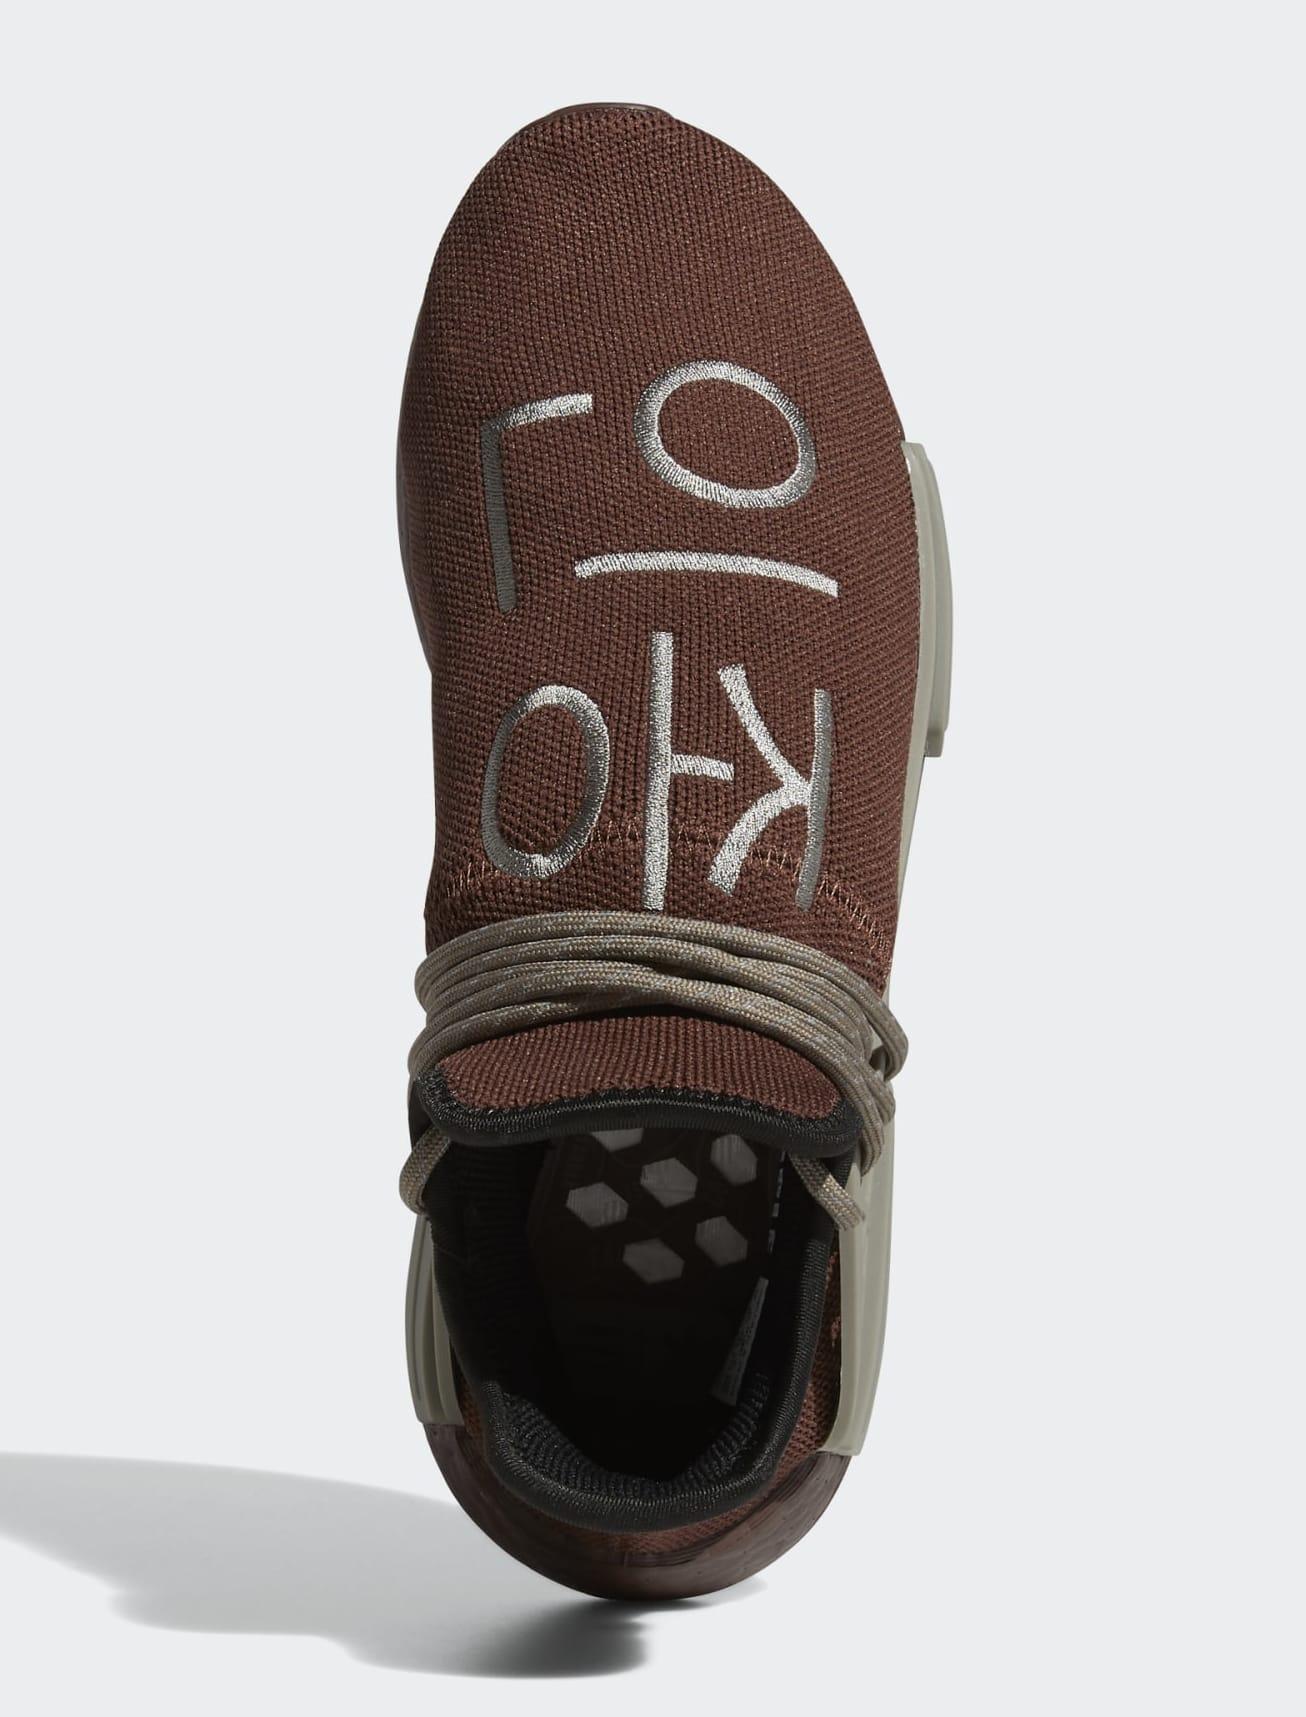 Pharrell Adidas NMD Hu Brown GY0090 Top